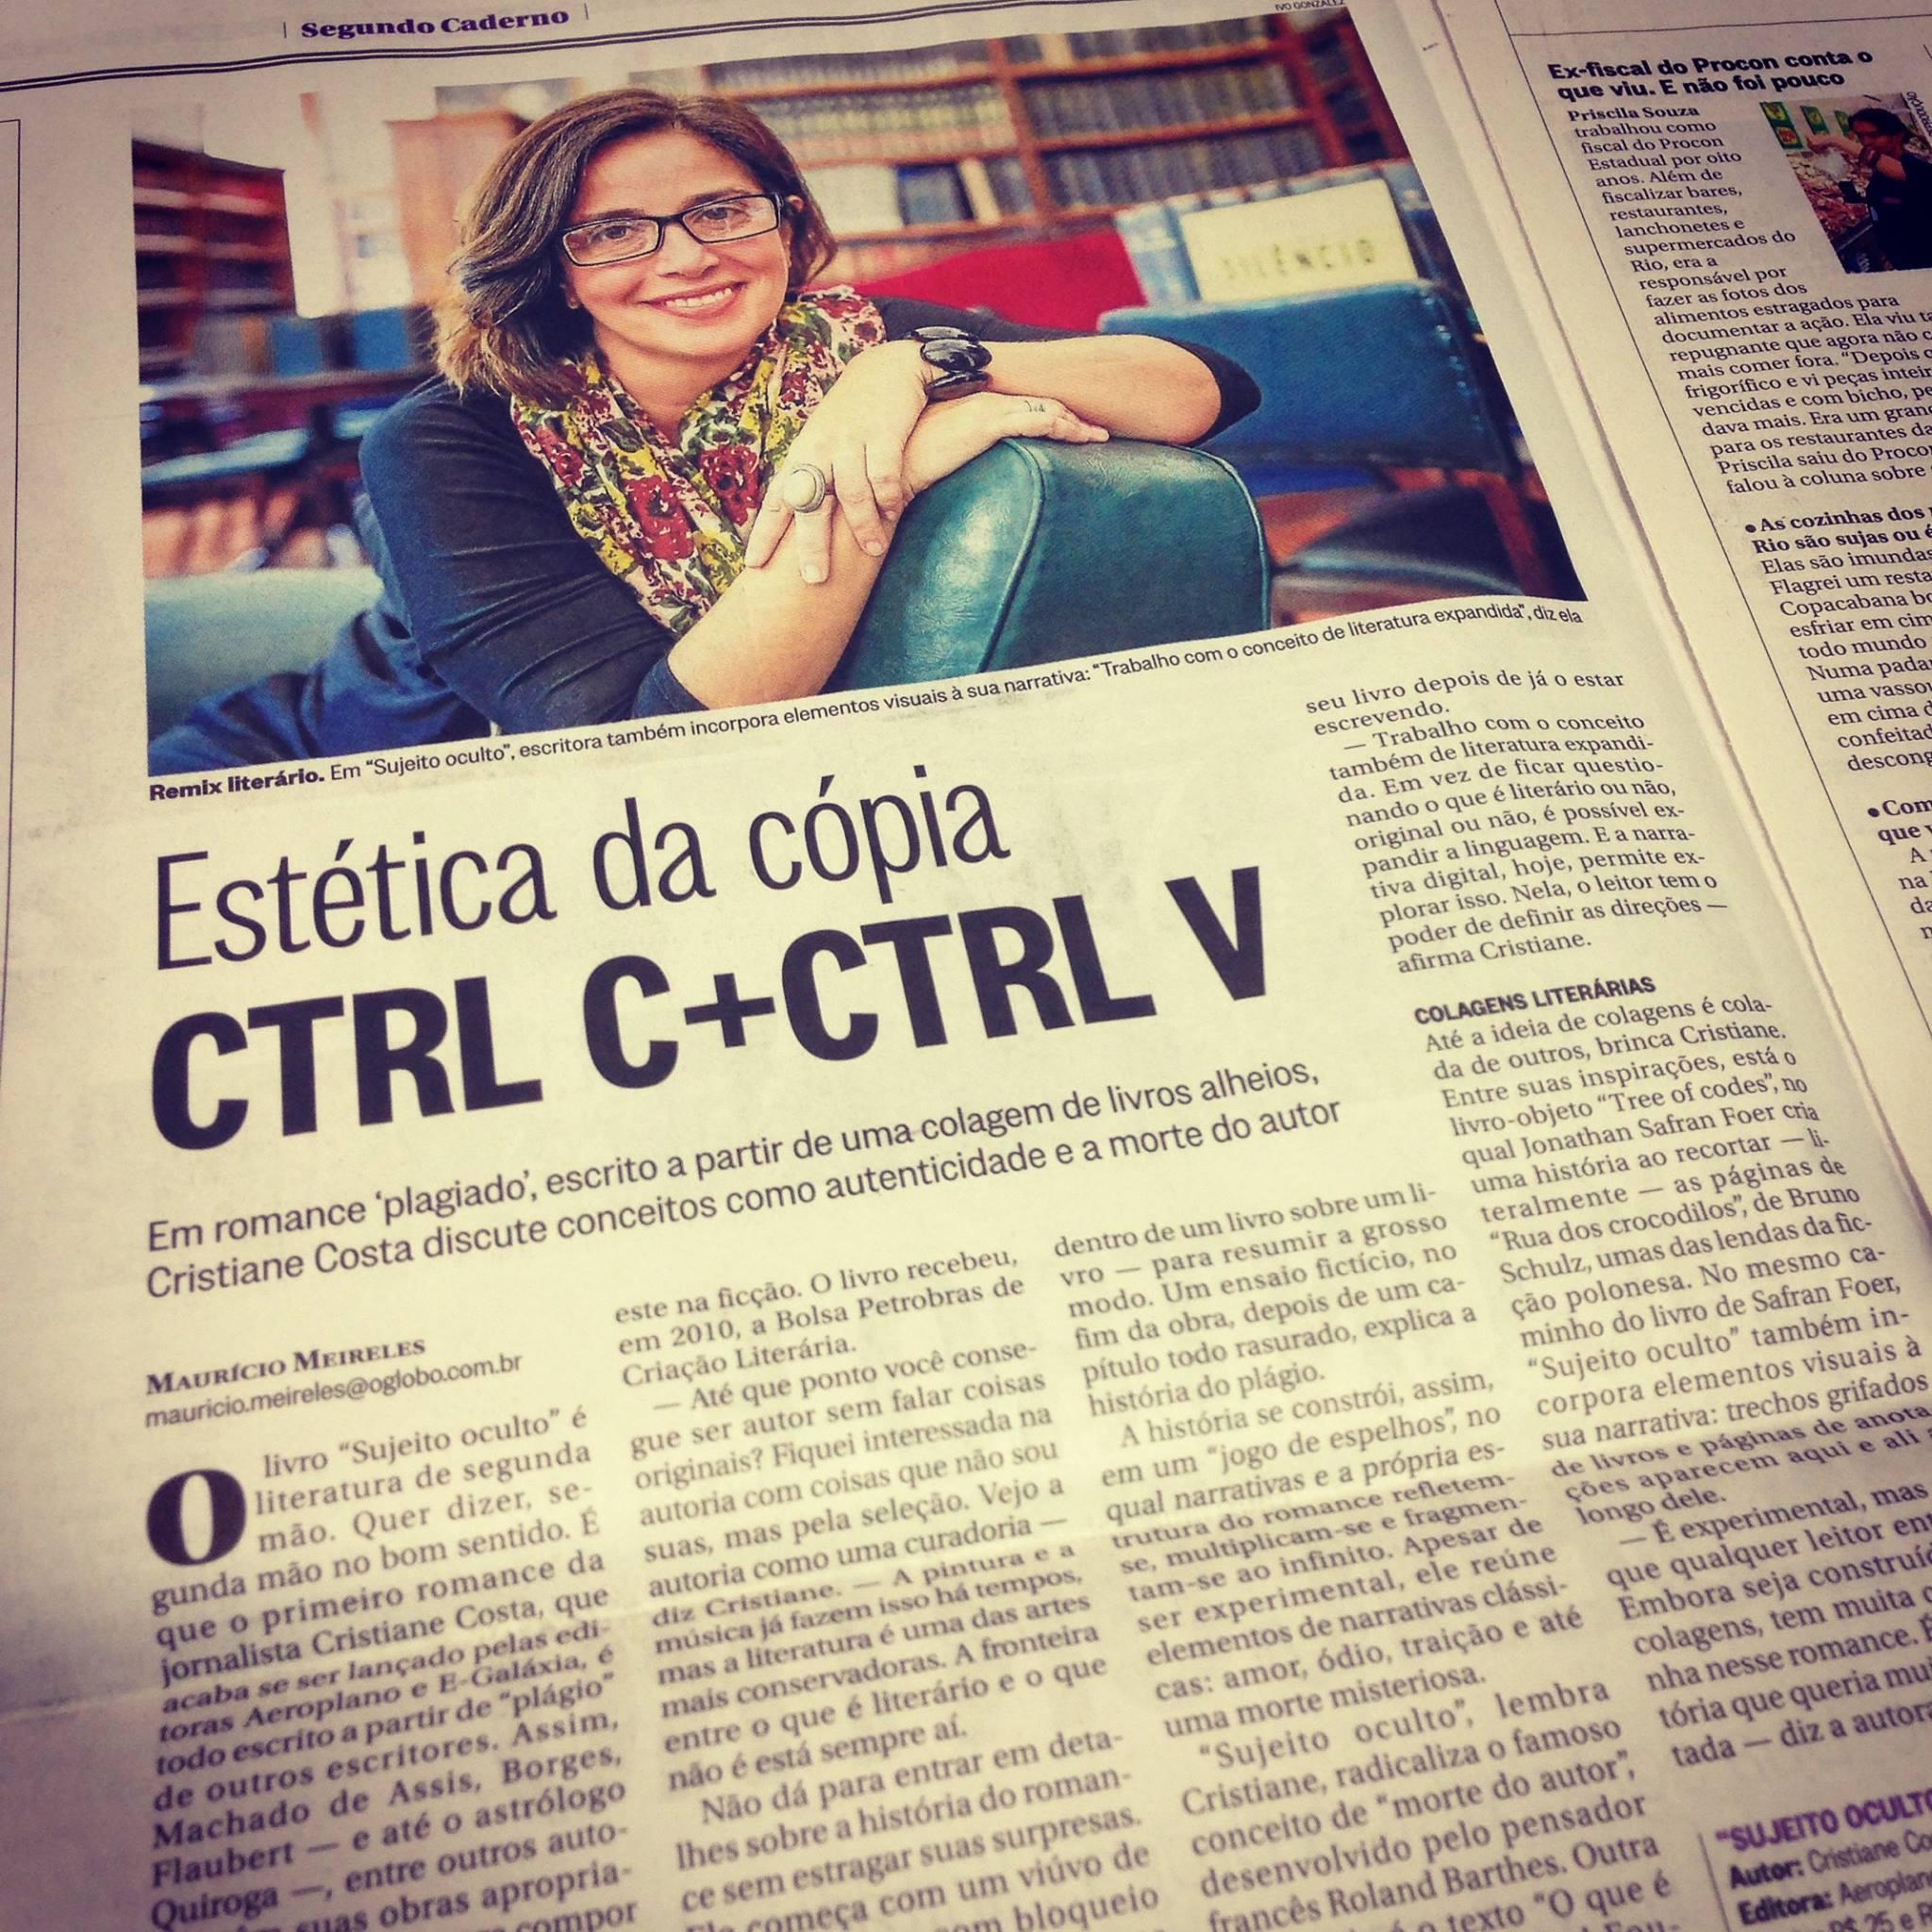 CTRL C + CTRL V